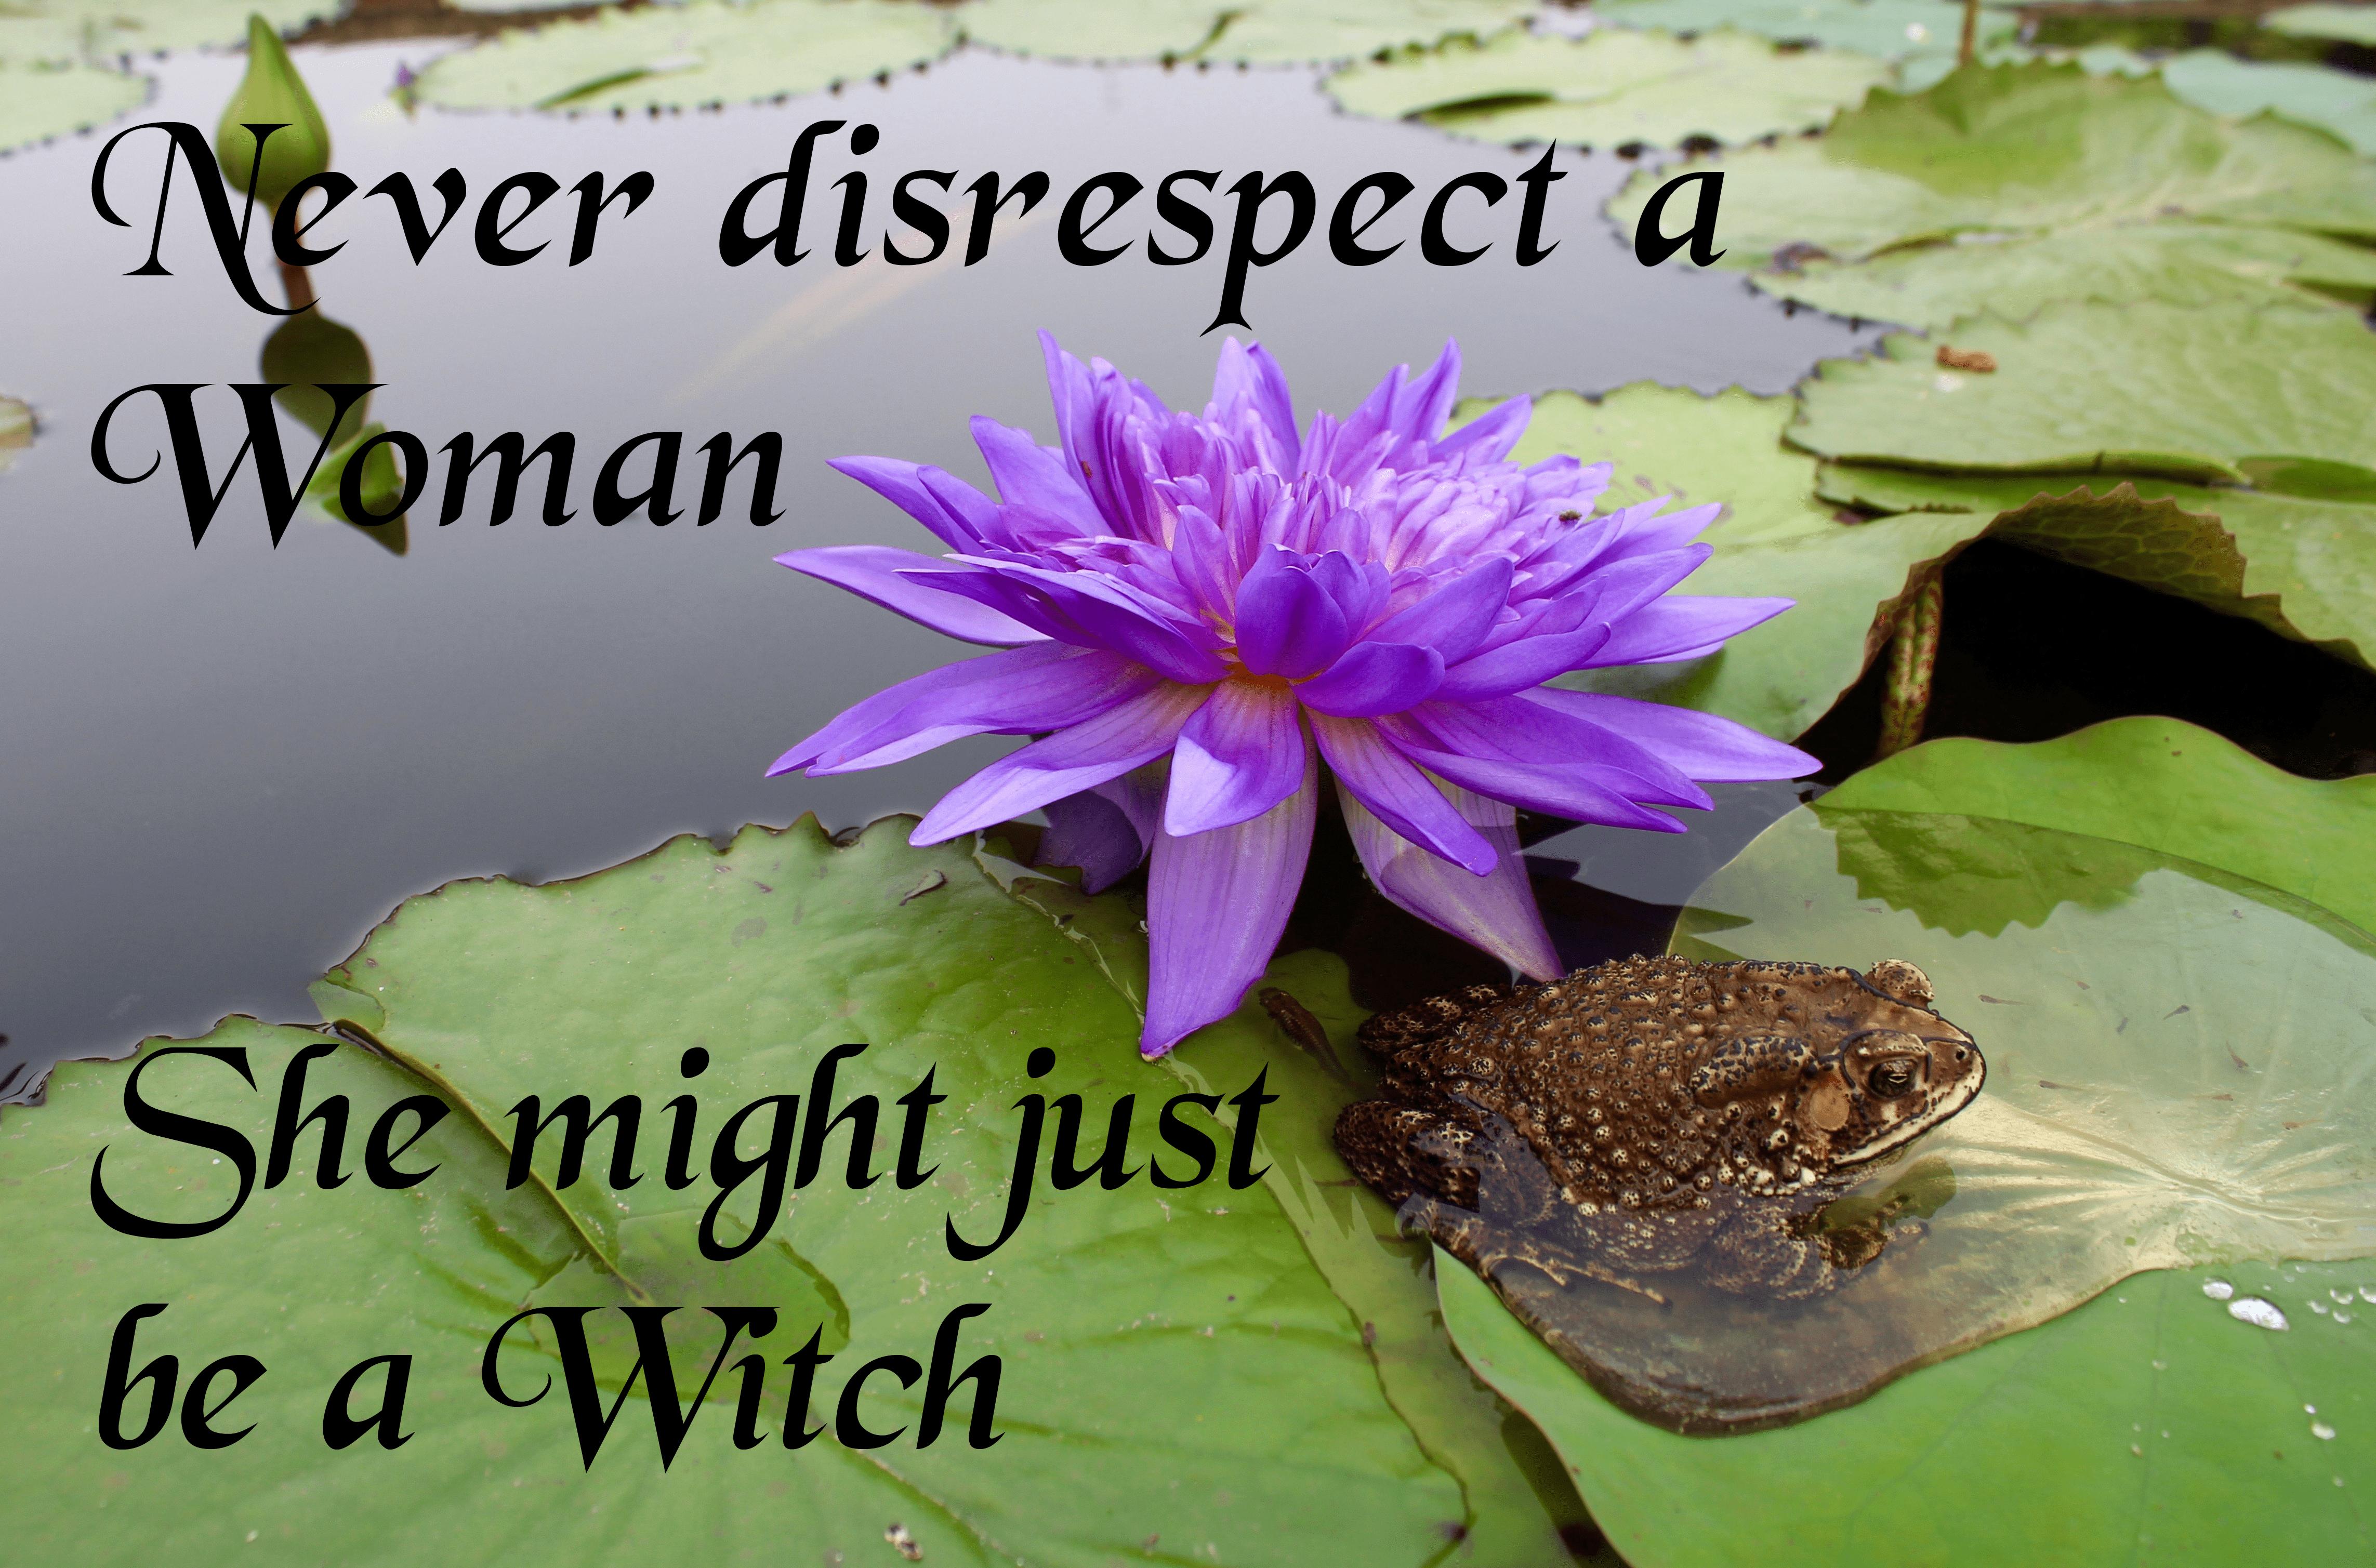 never disrespect a woman